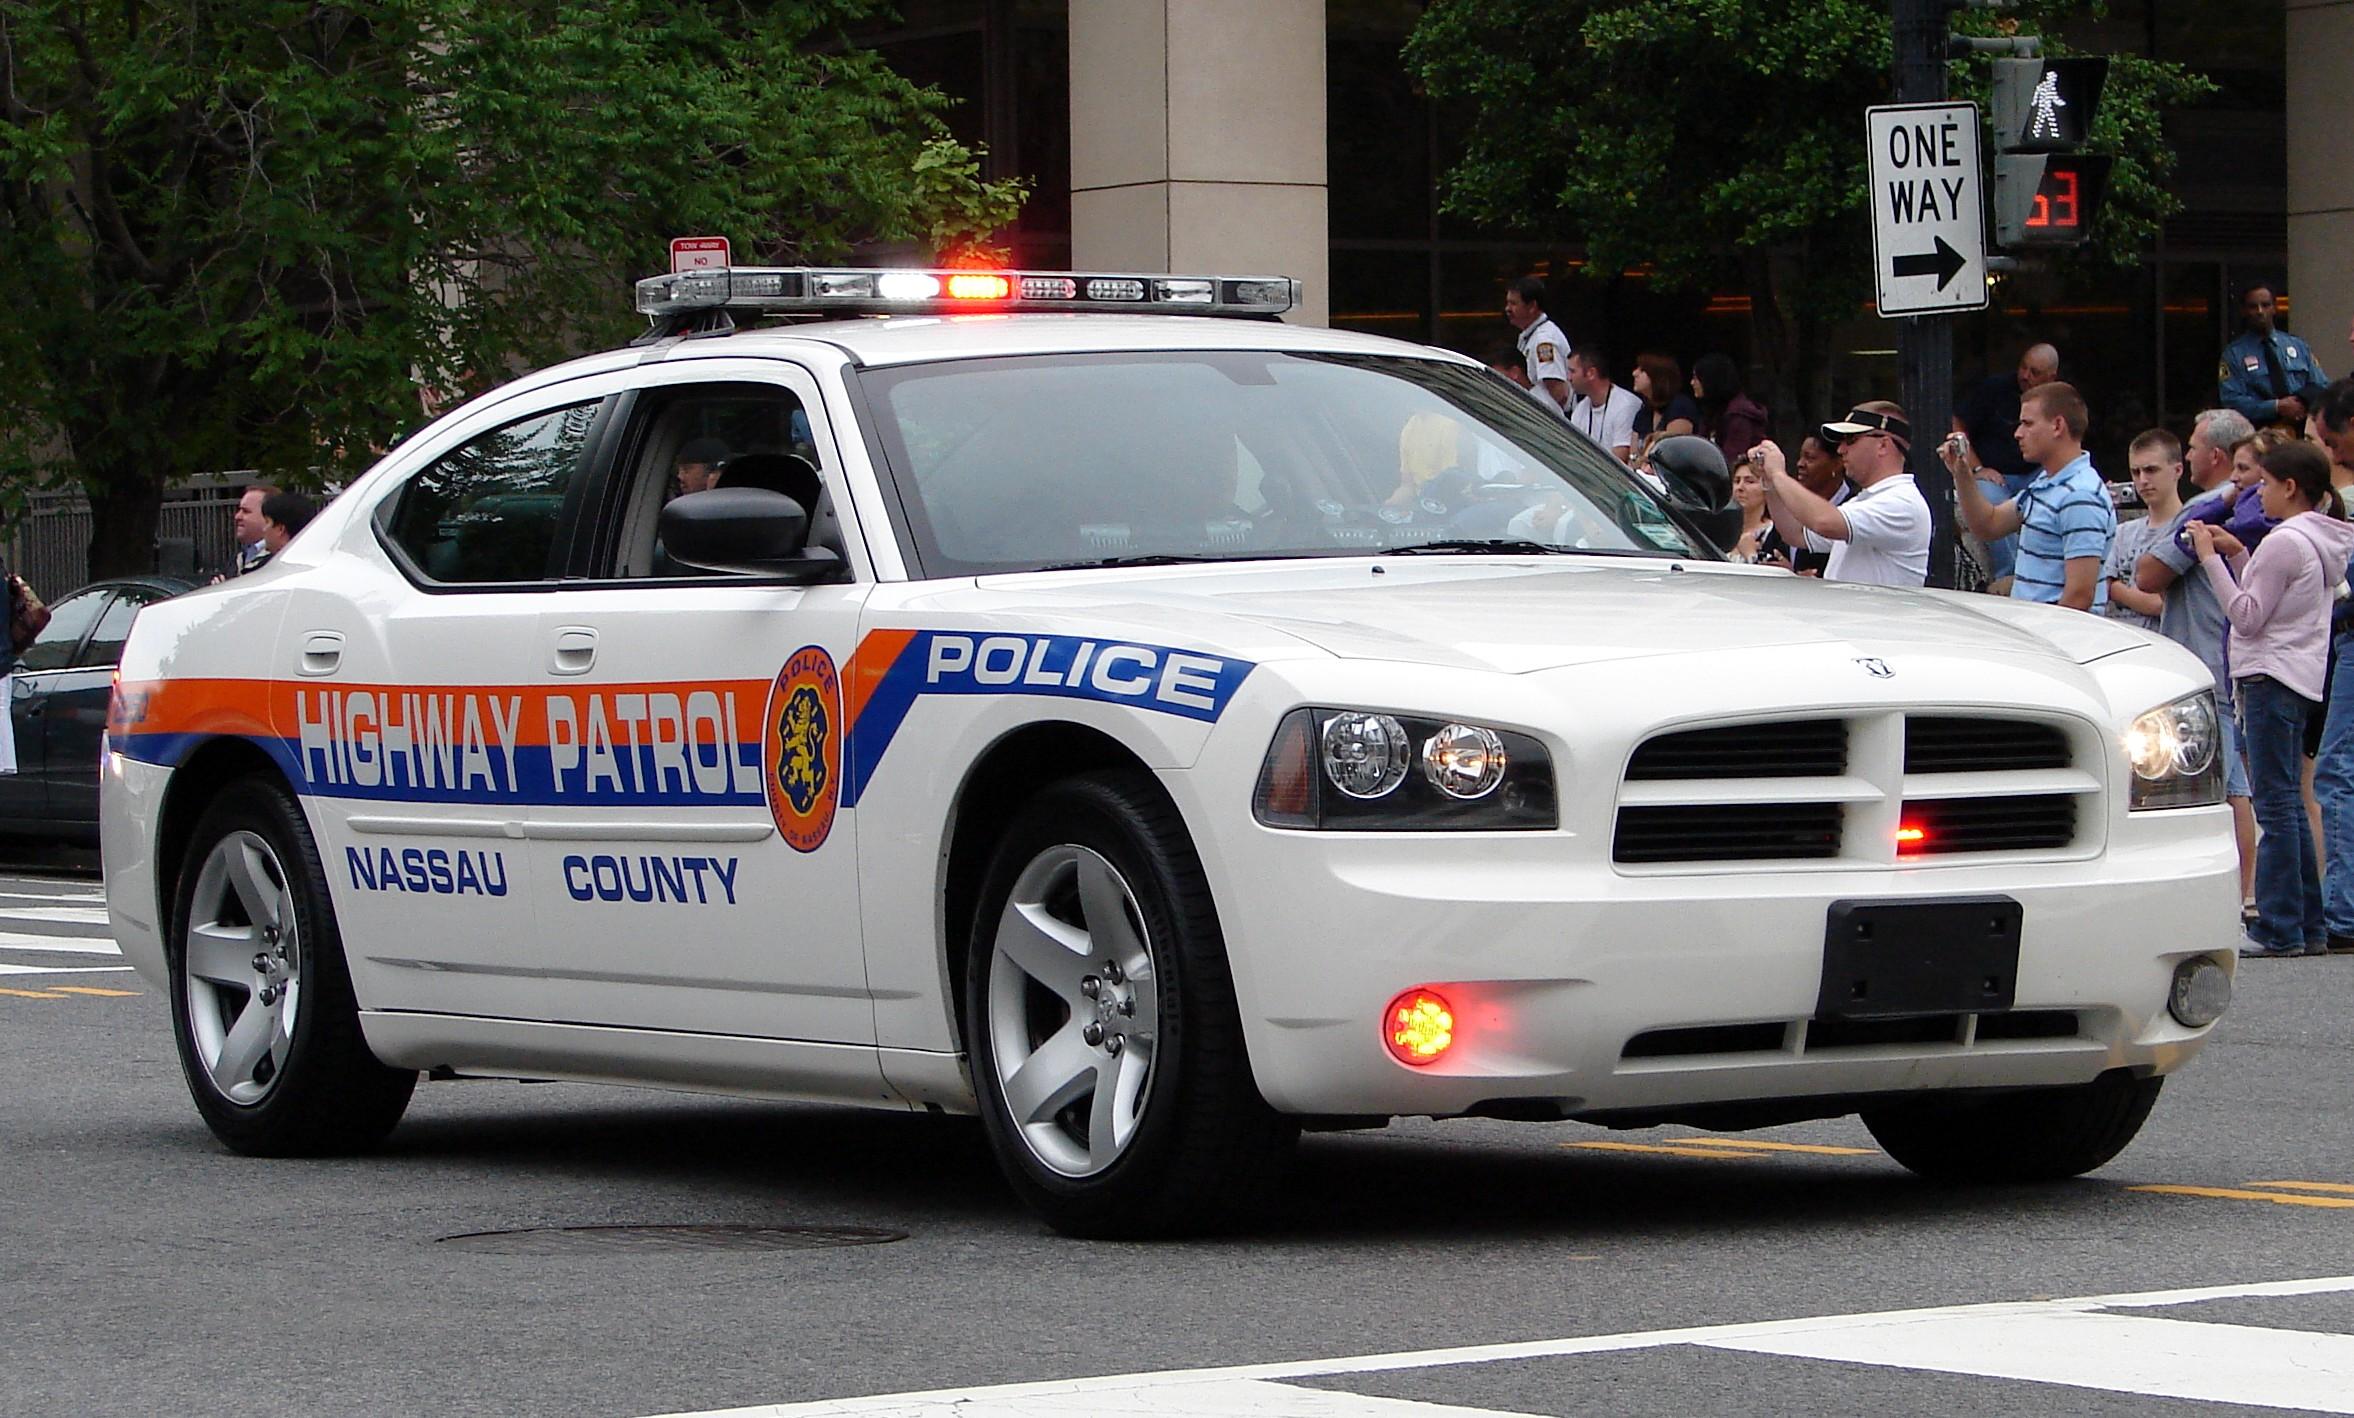 New York High Ranking Nassau Police Department Officials